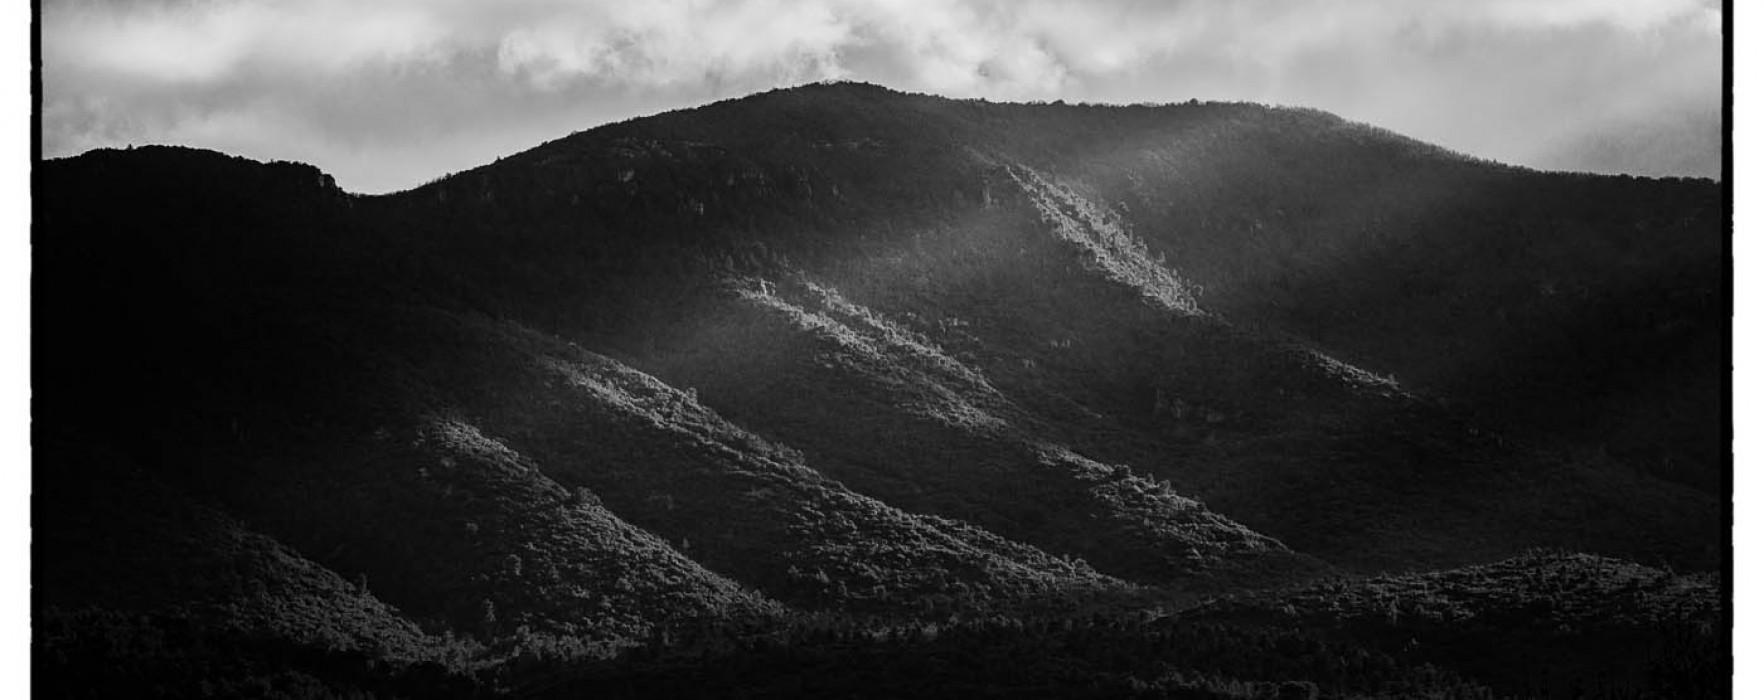 #190. Leica Apo-Telyt 135/3.4 (on Sony A7r) : the Long Ranger